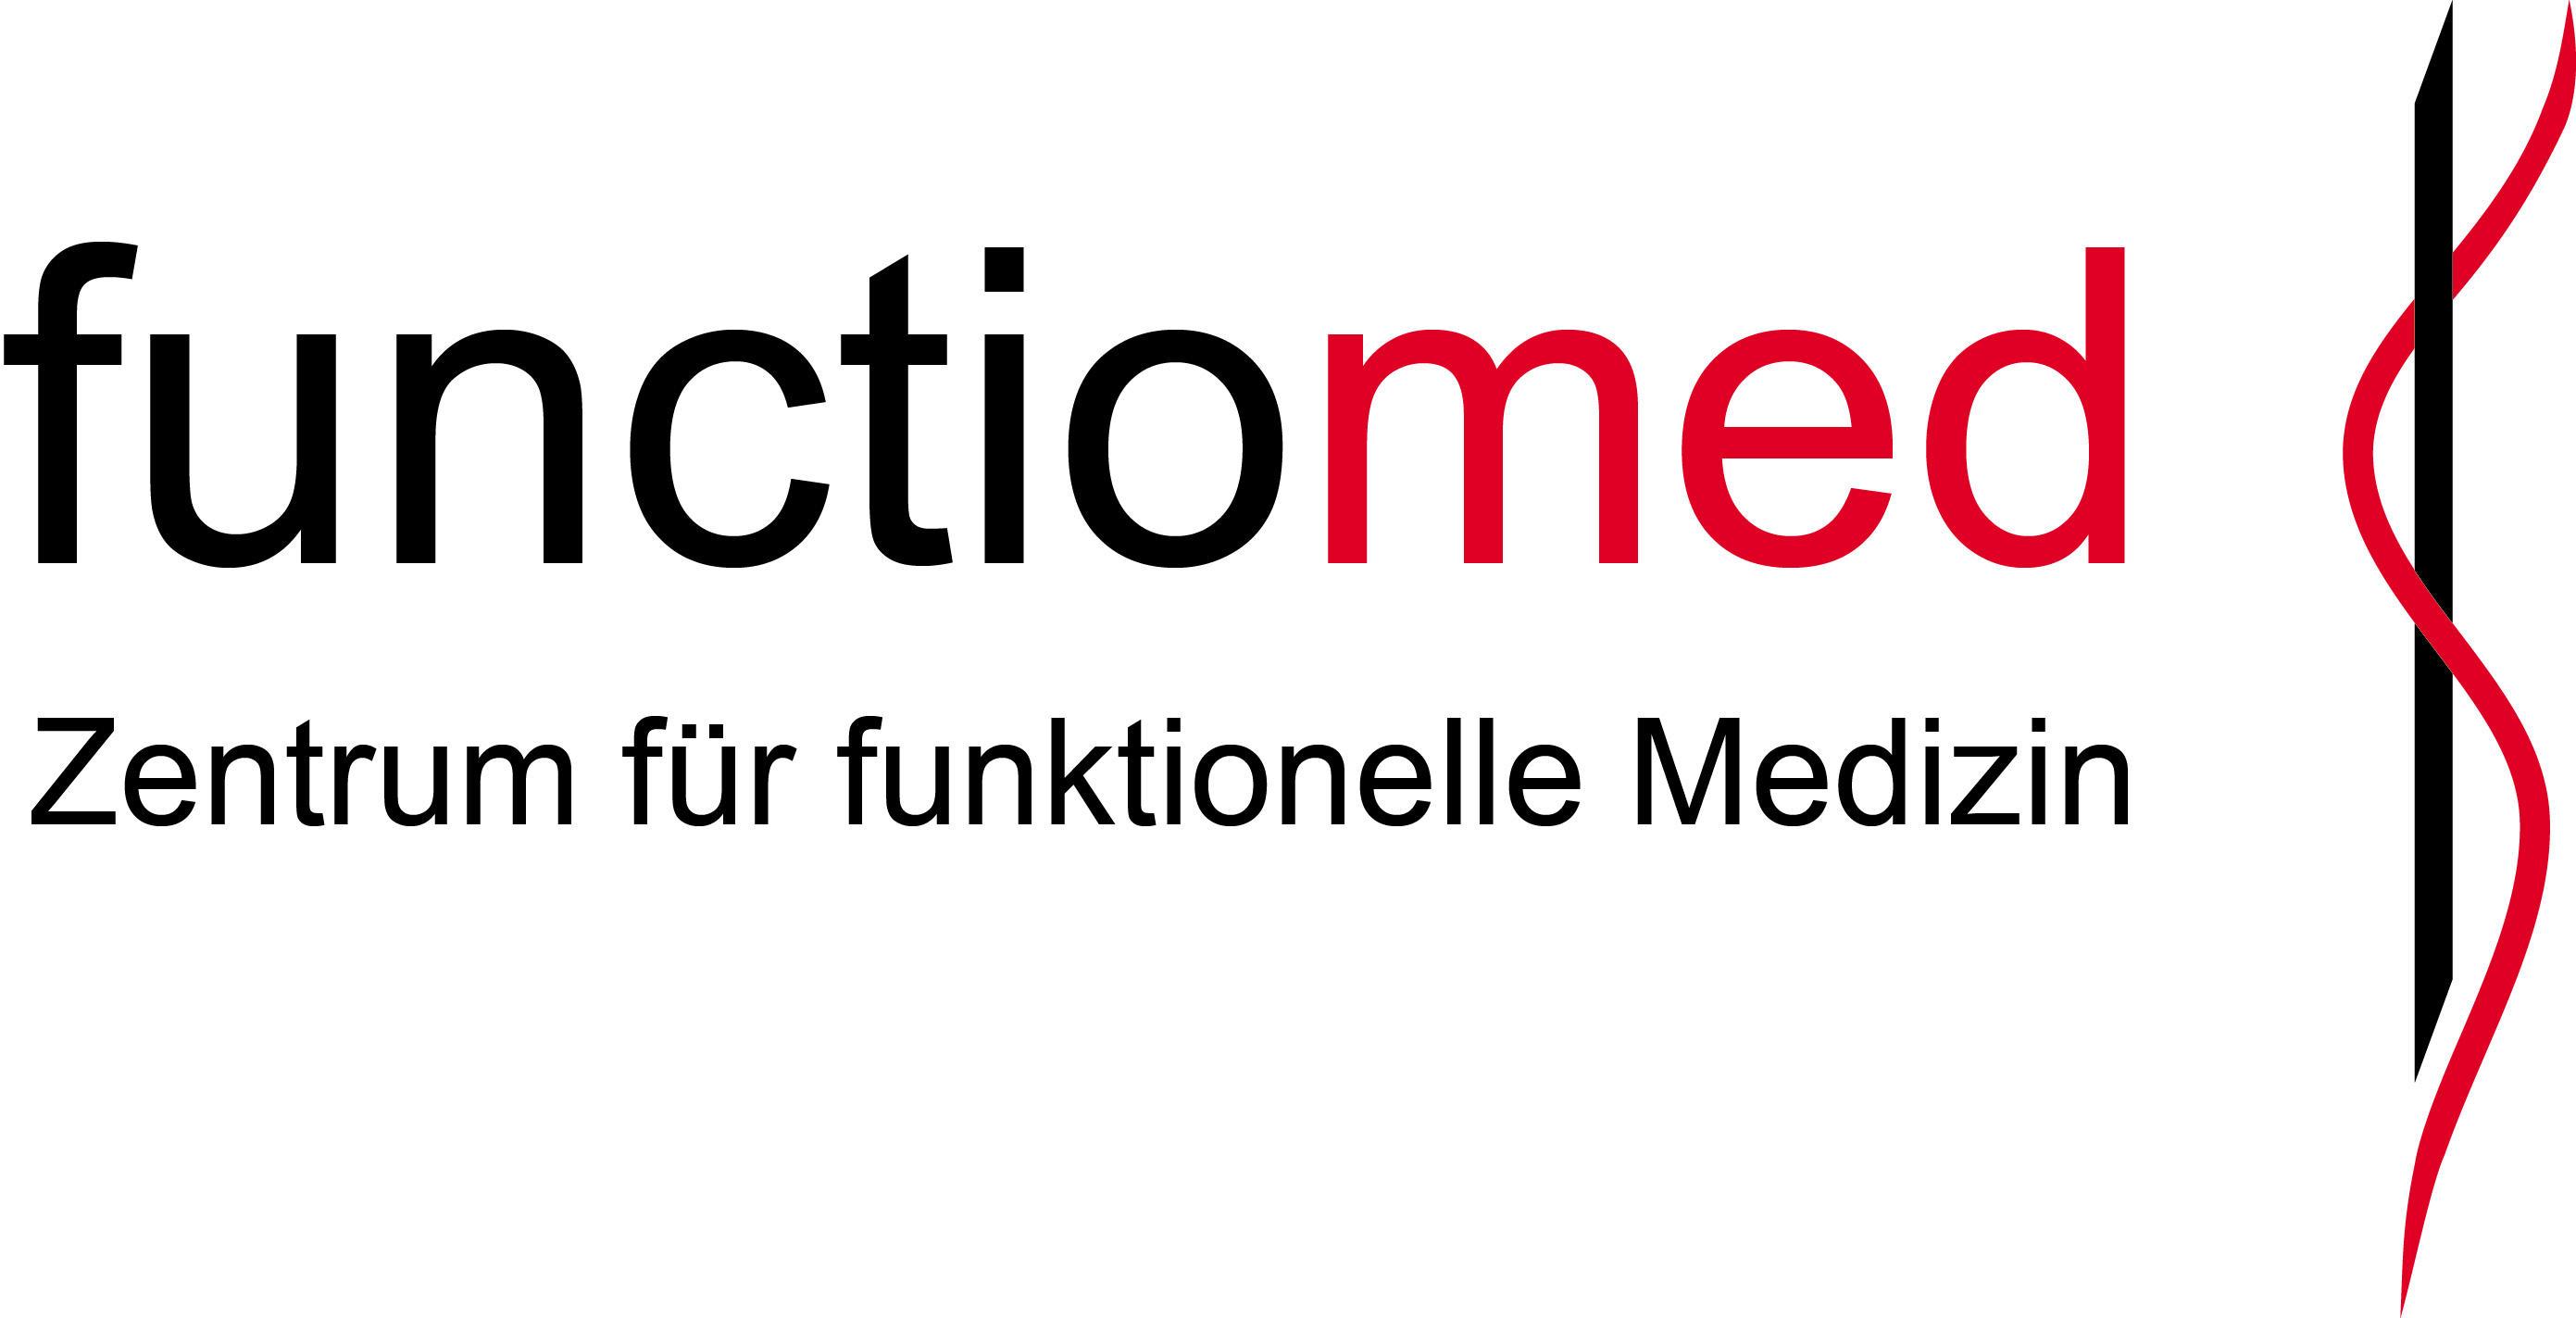 Functiomed GmbH